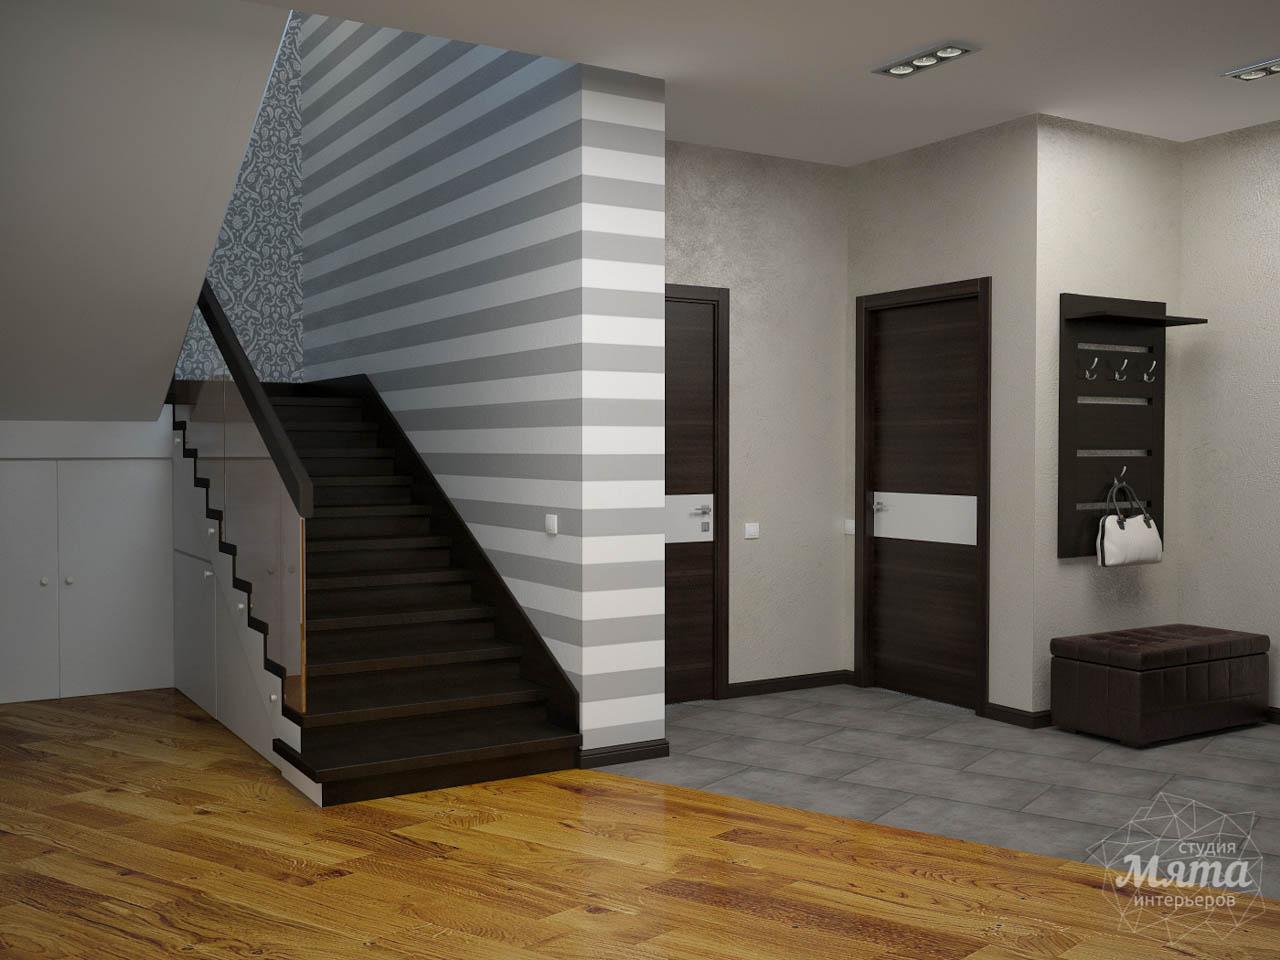 Дизайн проект интерьера коттеджа  в стиле минимализм по ул. Барвинка 15 img1227777746